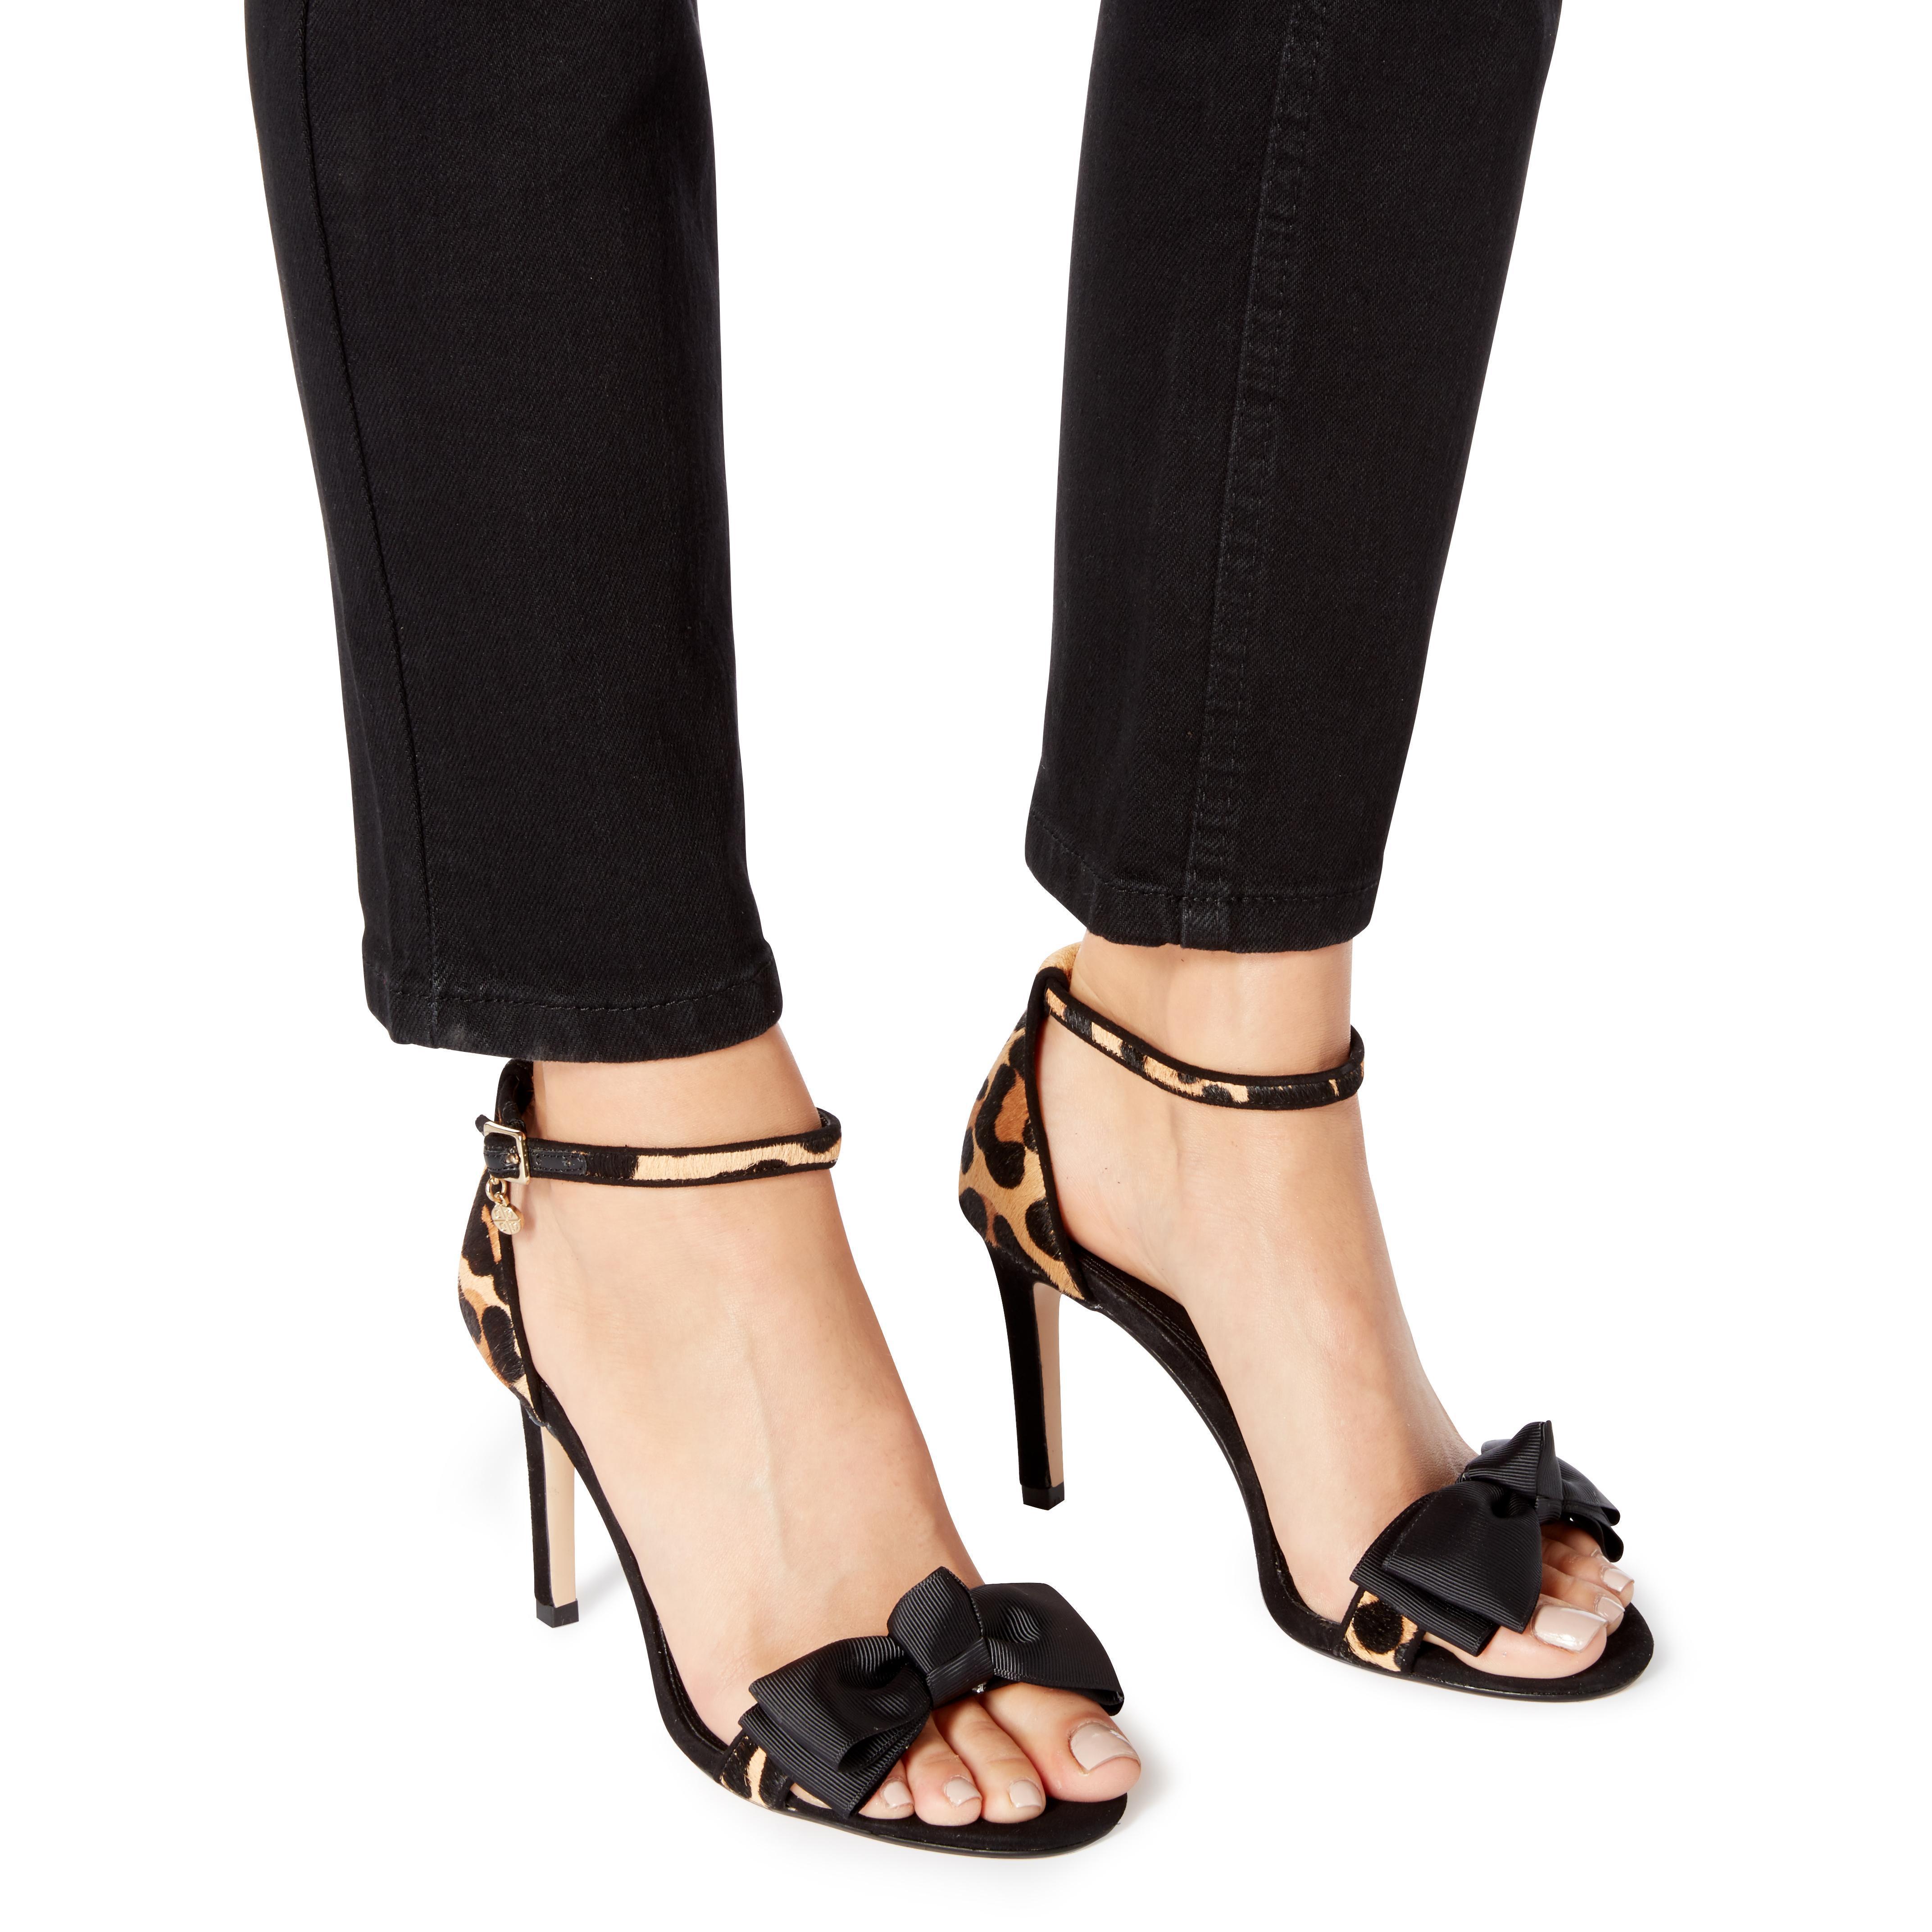 12e6e5d7ec4 Lyst - Dune Layered Grosgrain Bow High Heel Sandal